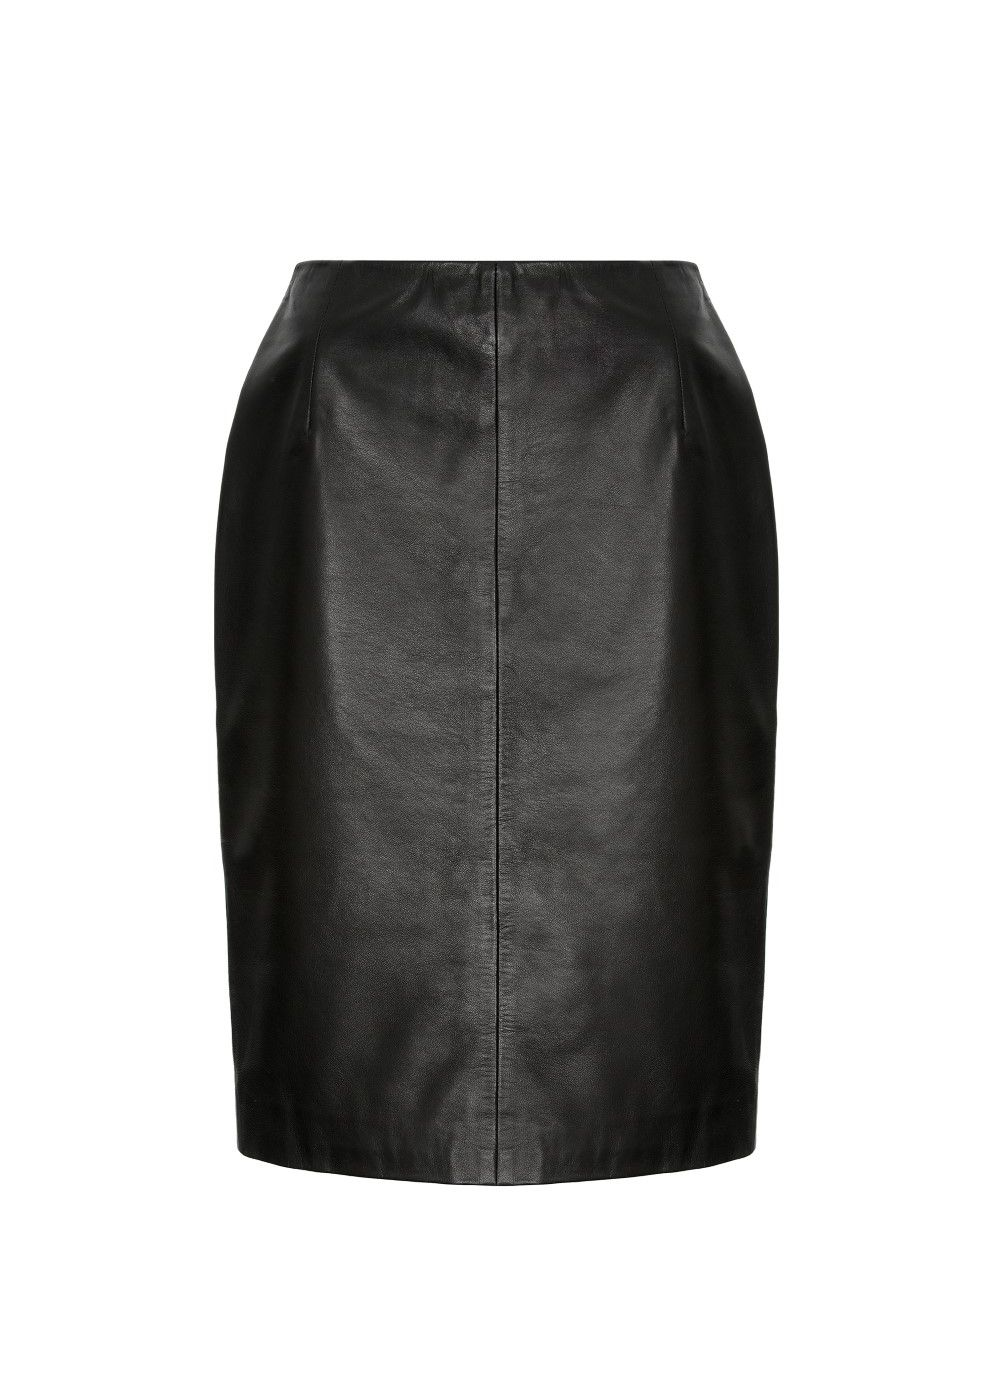 Spódnica damska SPCDS-0031-5010(W21)